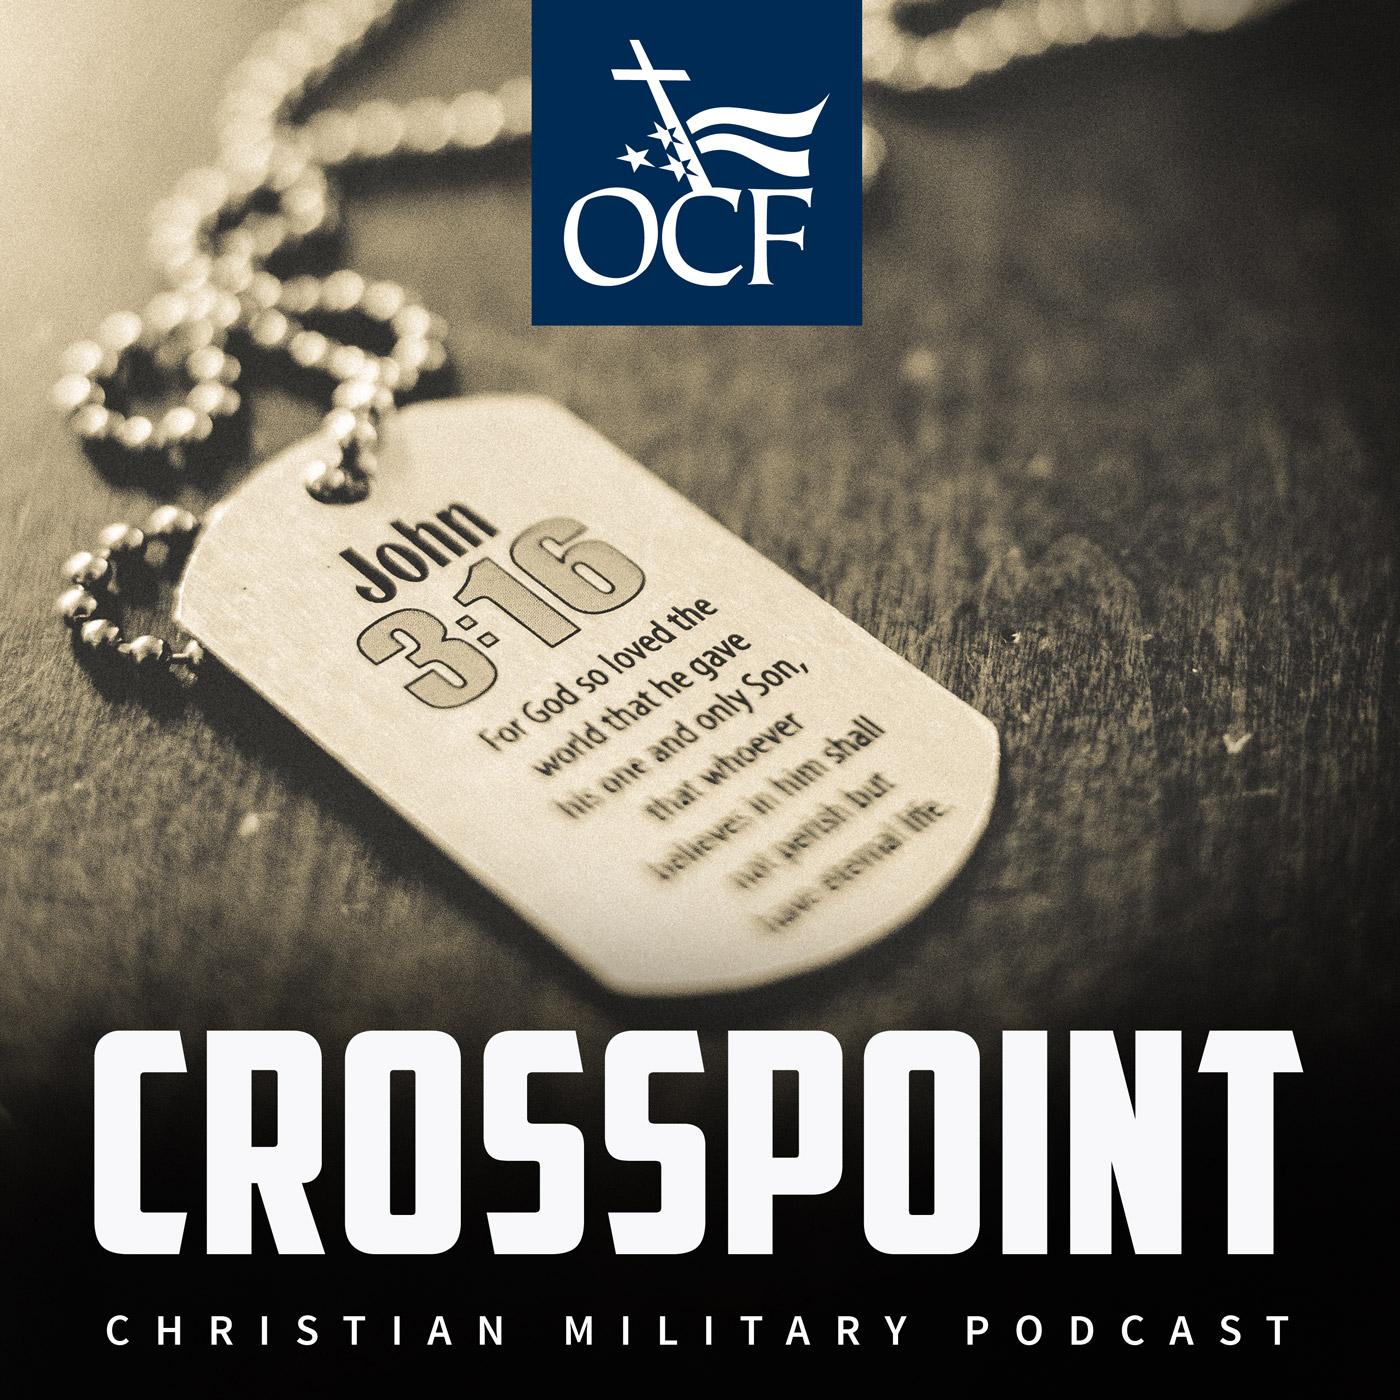 OCF Crosspoint Podcast show art